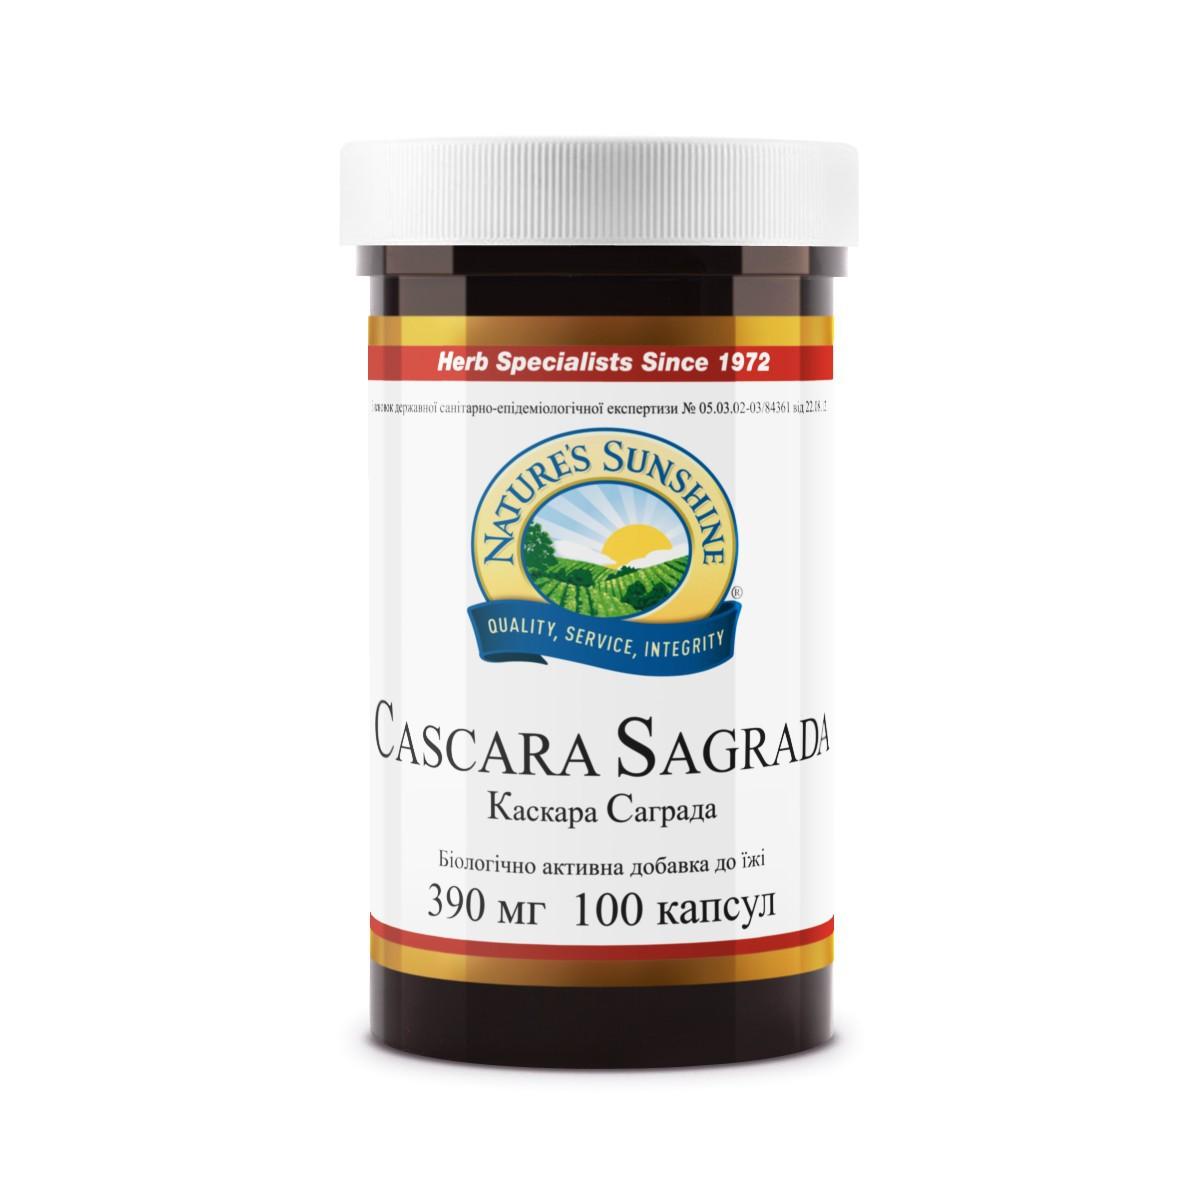 Kit Casсara Sagrada [170*5] (-10%)